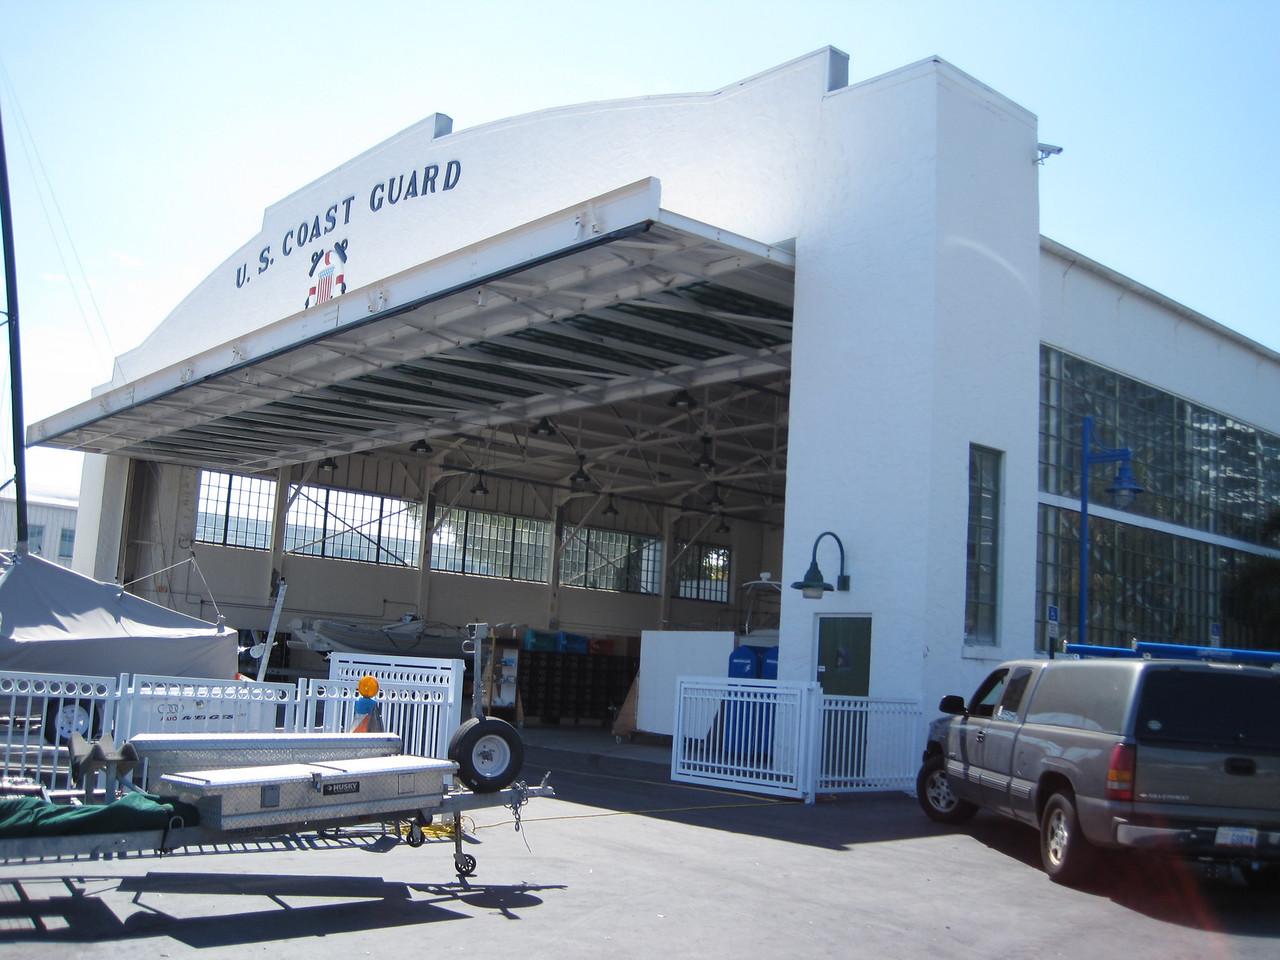 Seaplane hanger, Coast Guard base, now modern marina